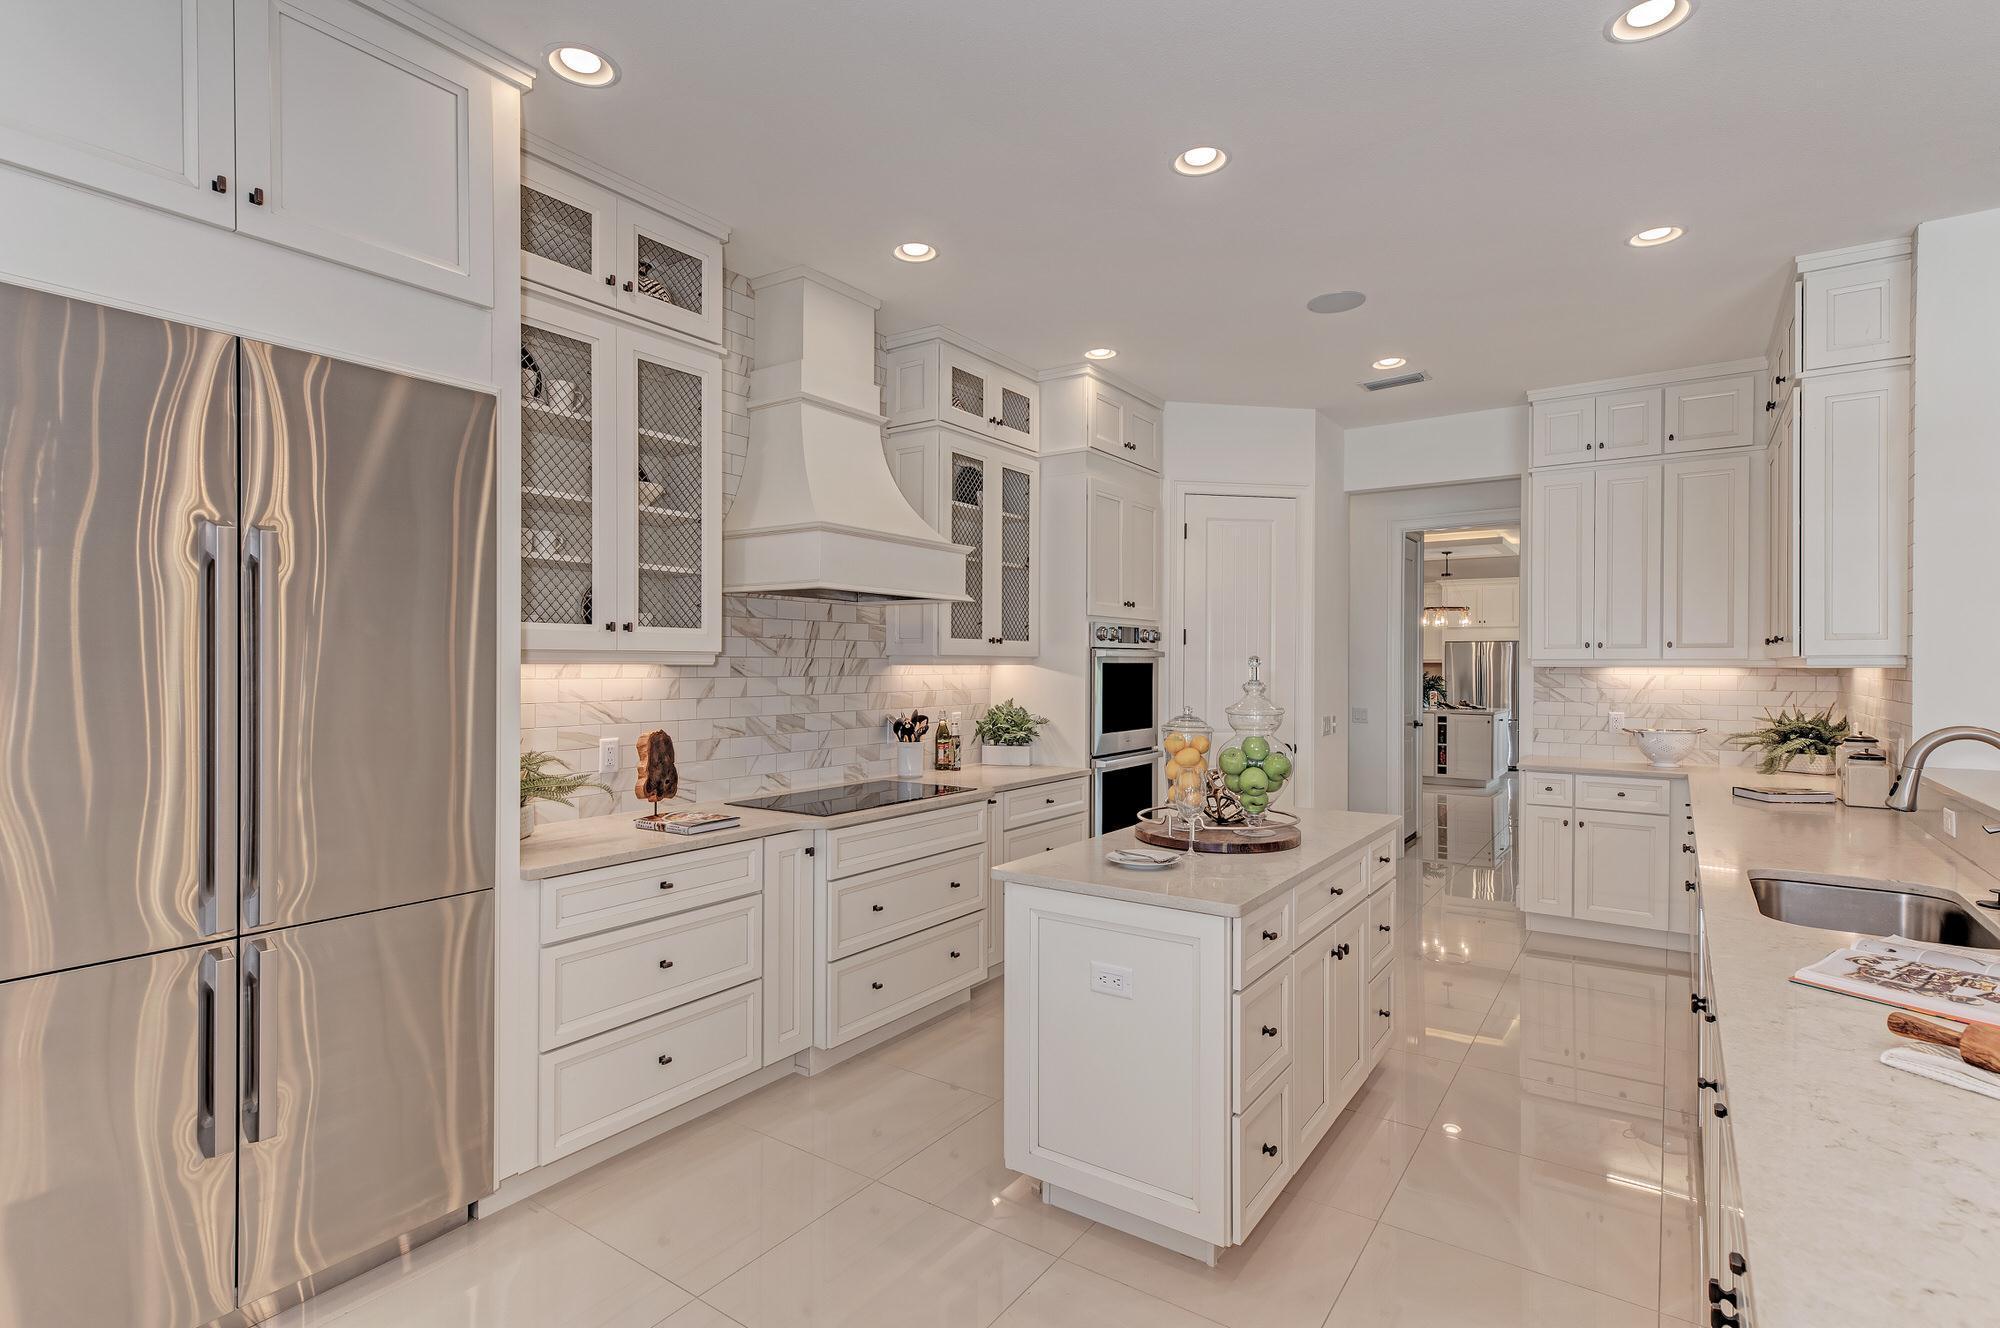 Kitchen featured in the Grand Santa Maria II By Medallion Home in Sarasota-Bradenton, FL